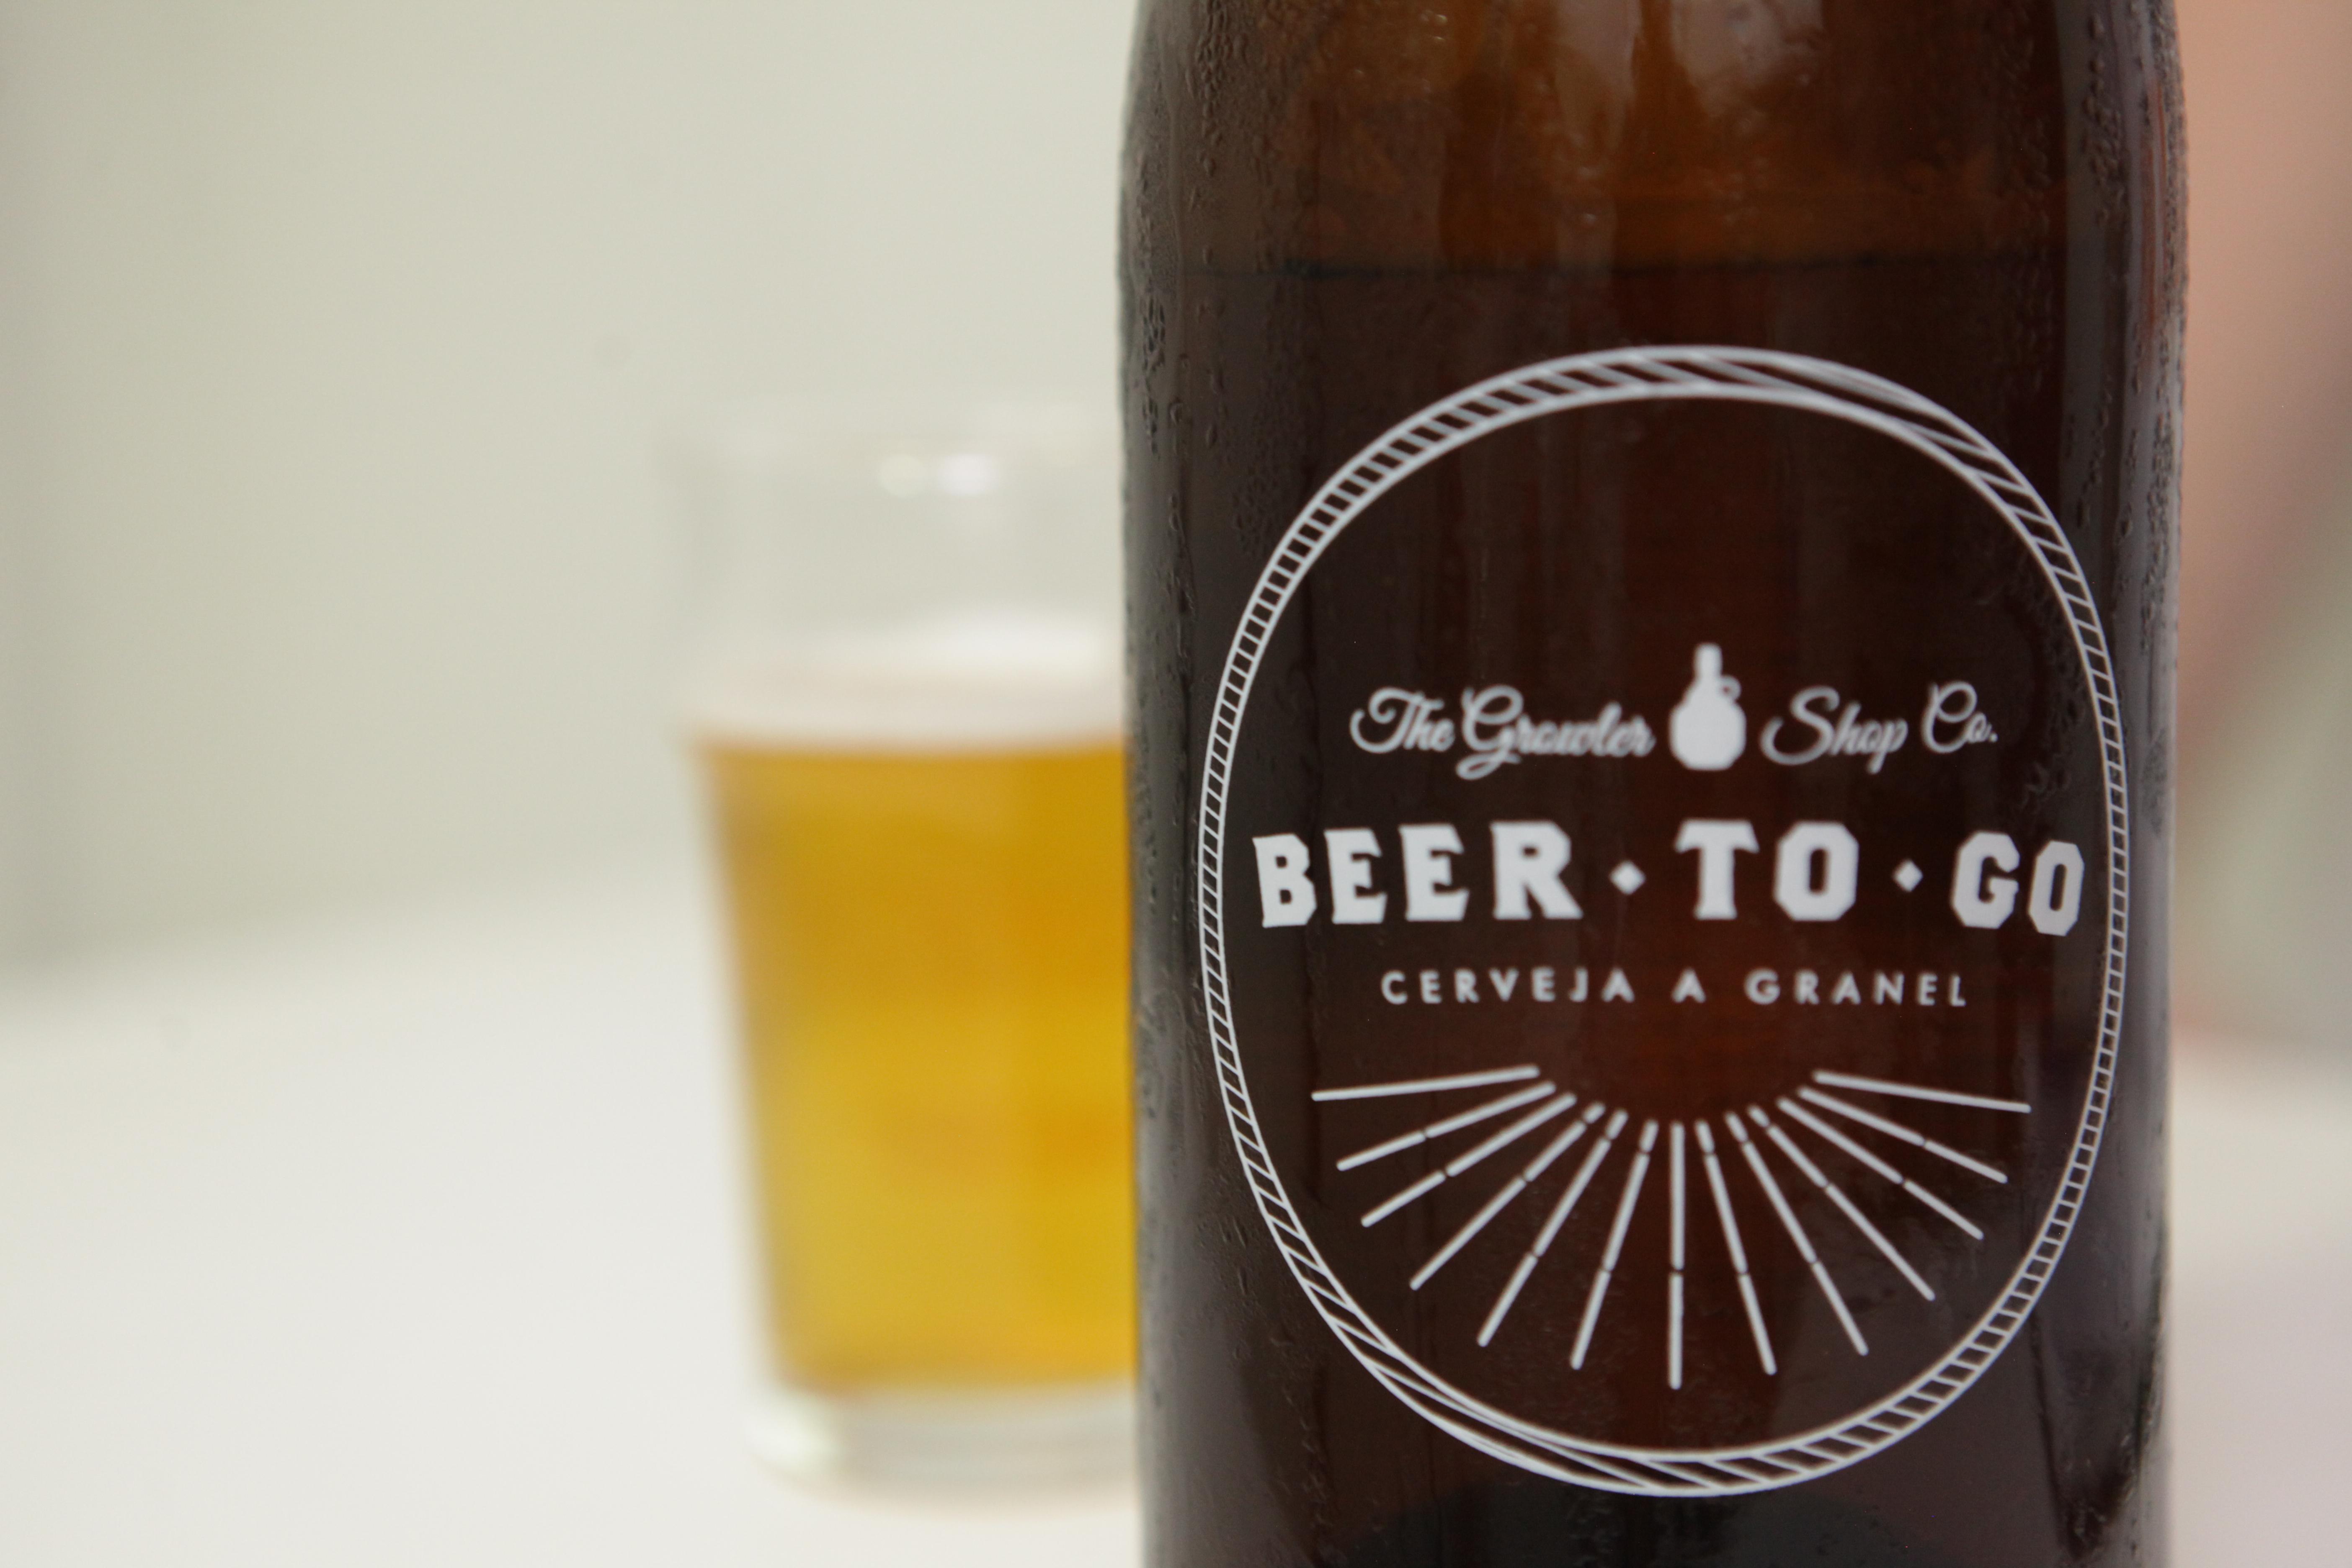 Fortuna Hey Hop - American Pale Ale